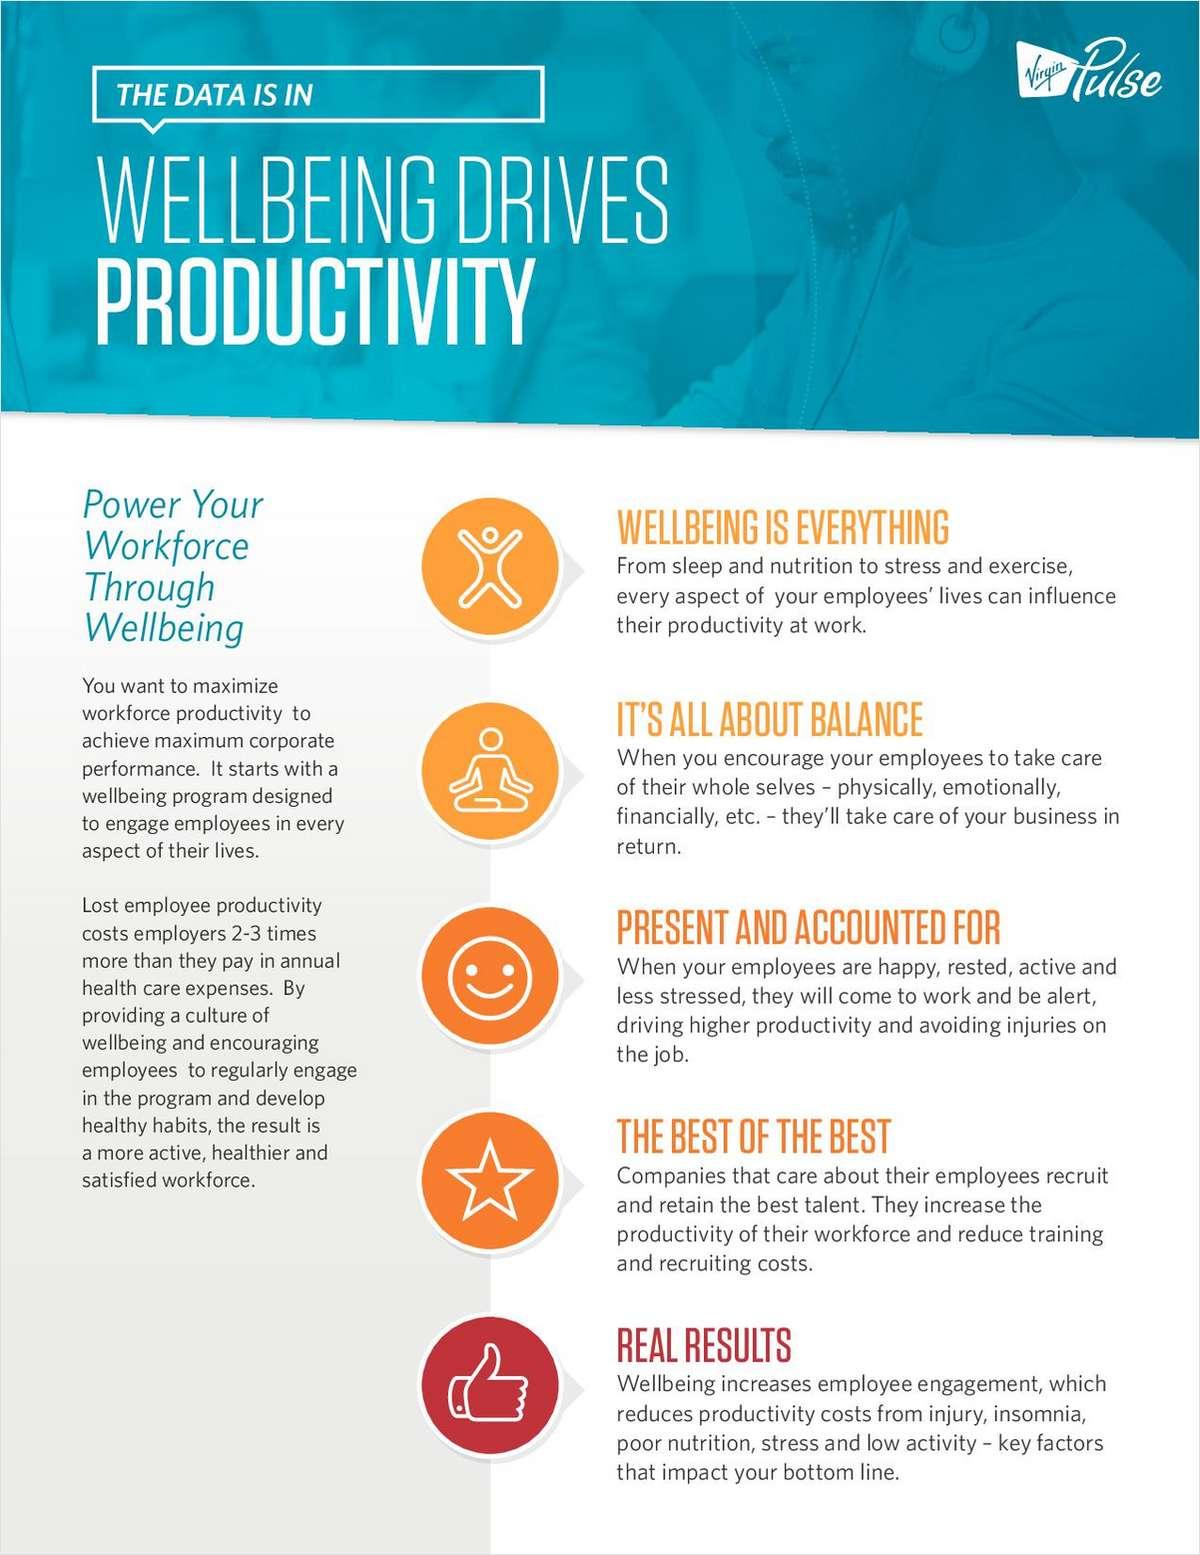 Power Your Workforce Through Wellbeing